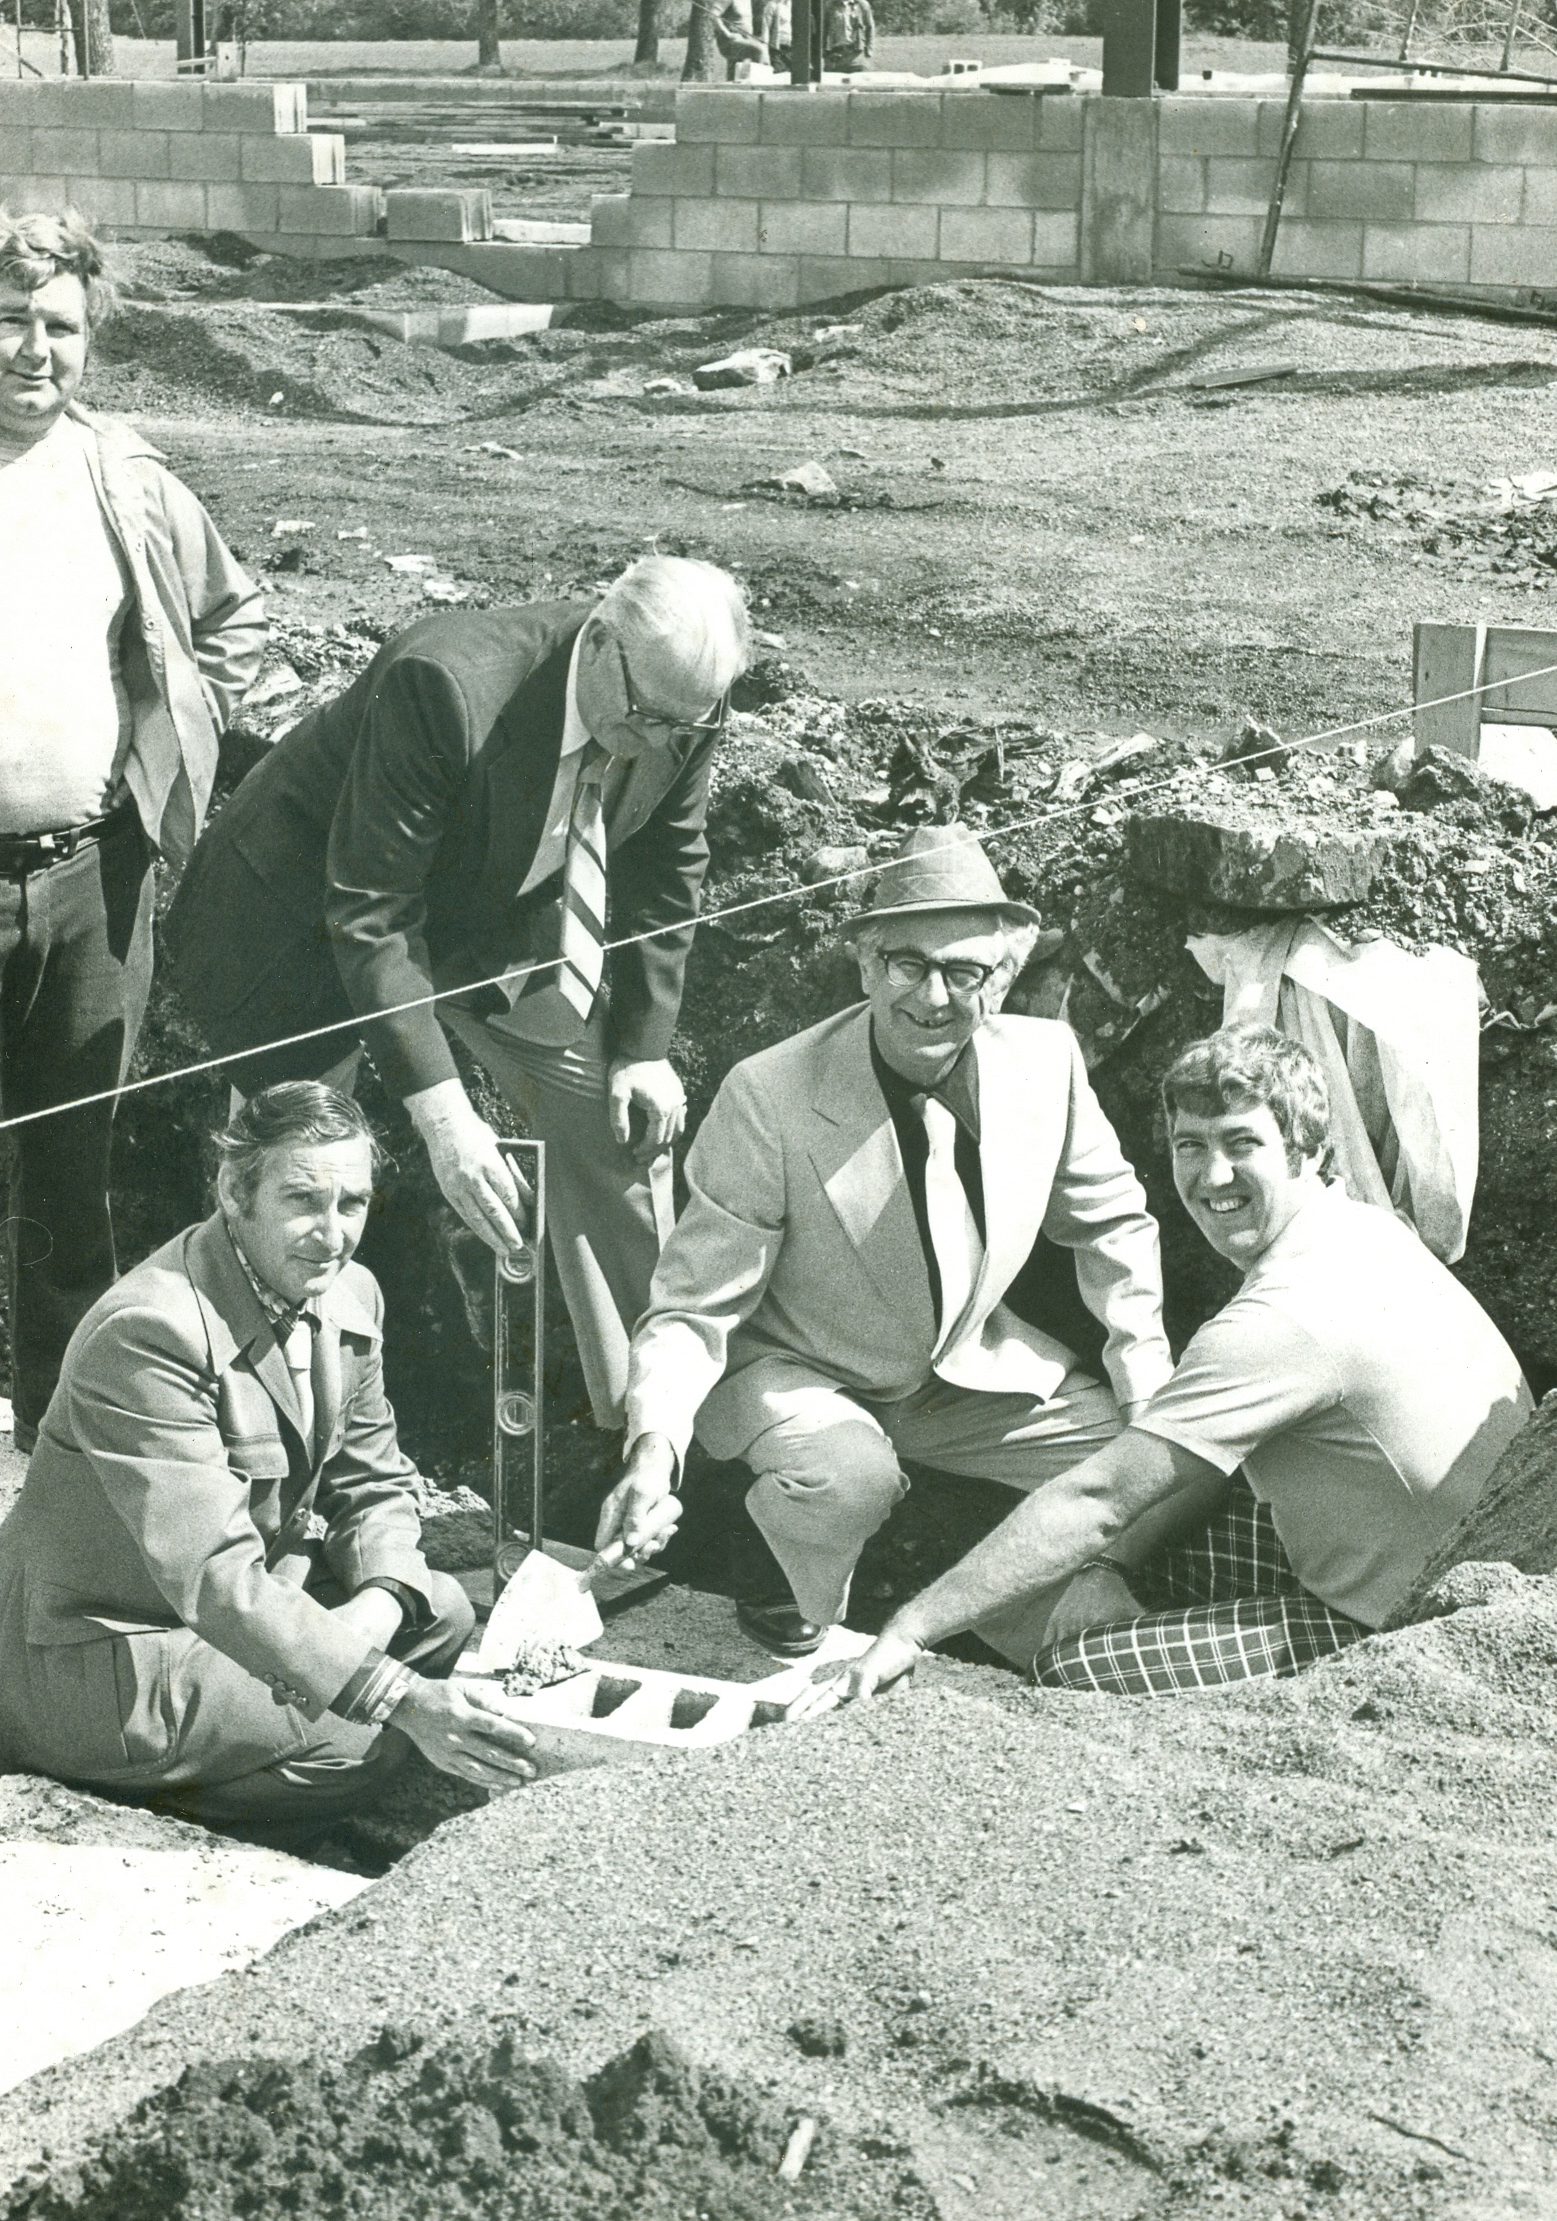 Graham Bell, Grant Airhart, Clete Green